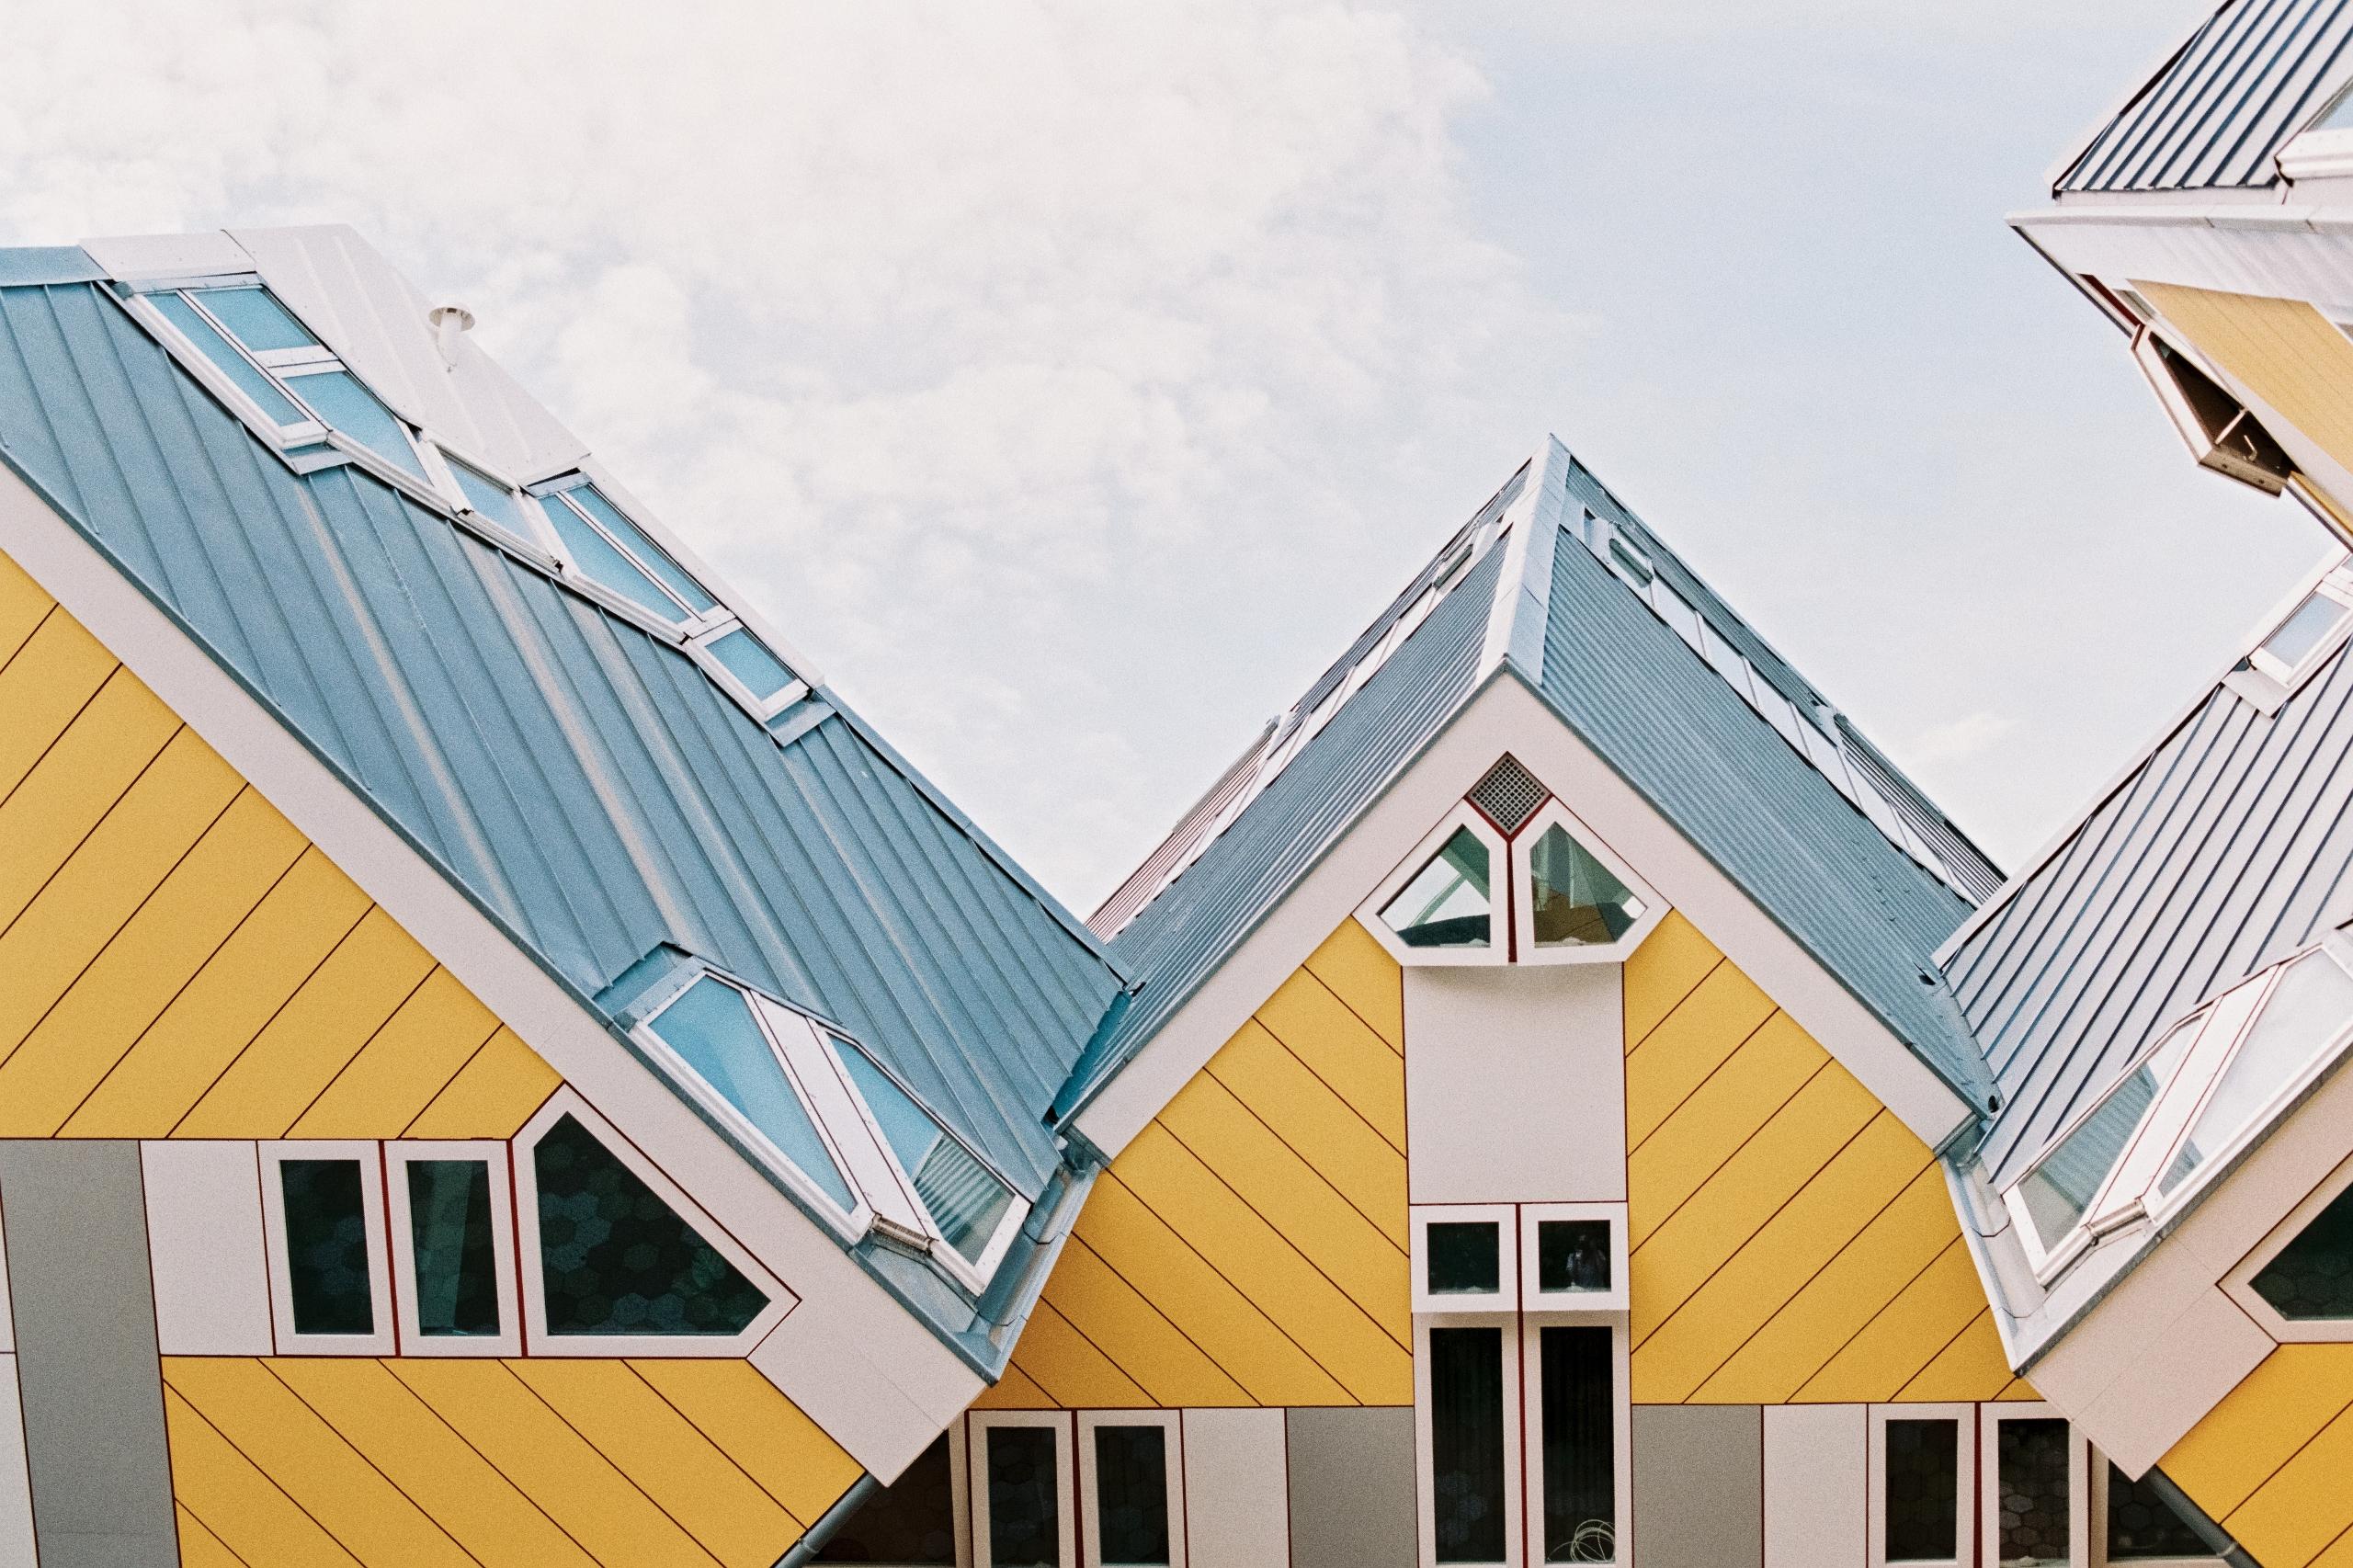 Kubuswoningen (Cube Houses) Rot - michelleamock | ello